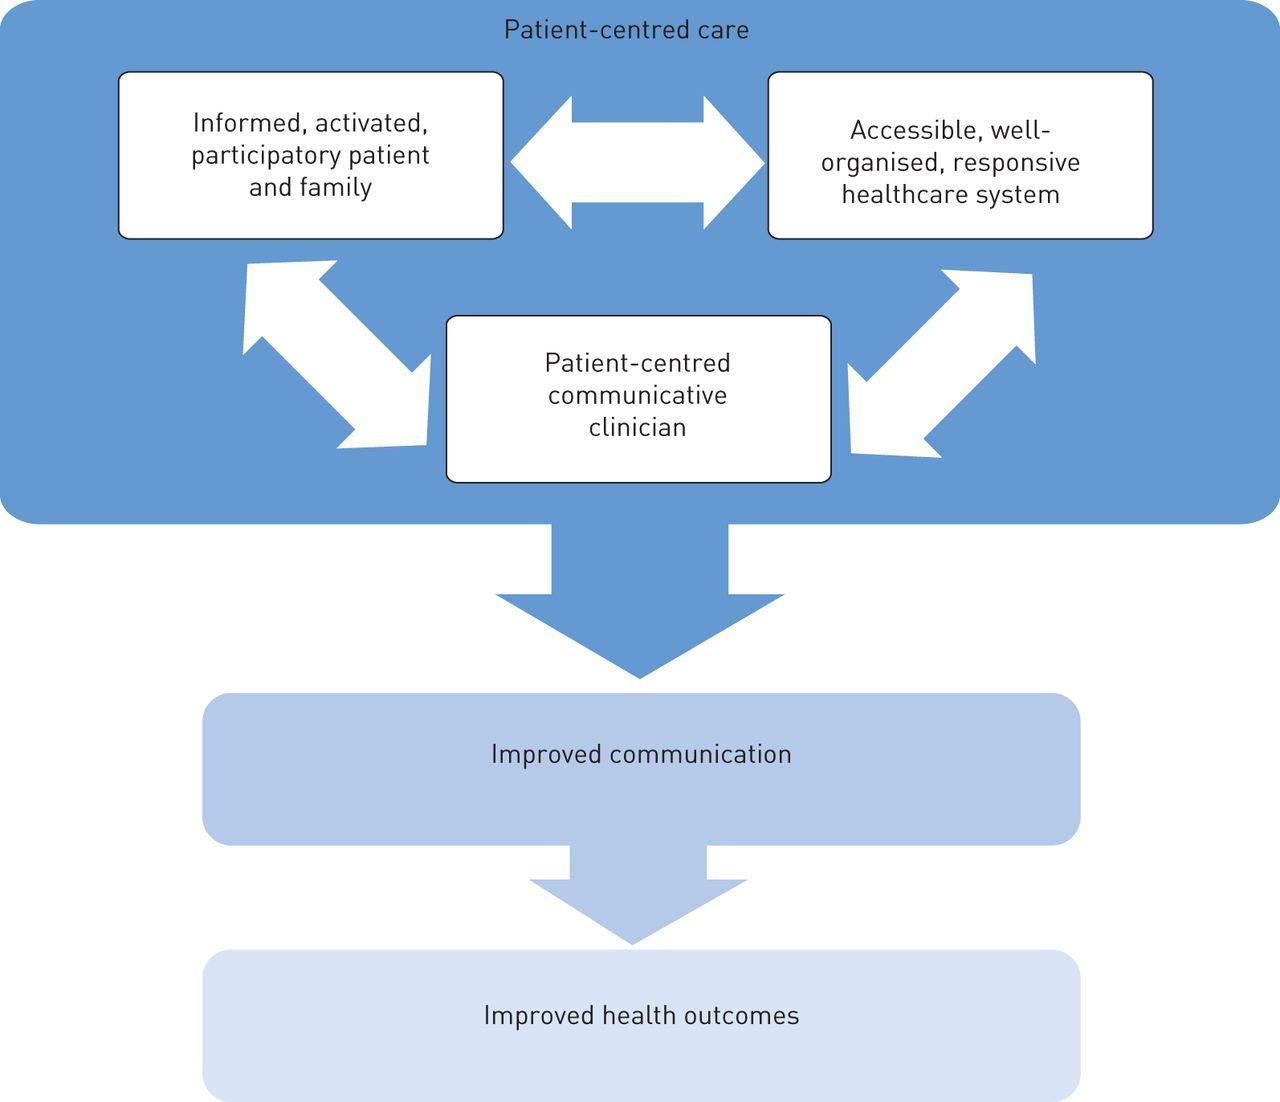 Facebookthesis Web Fc2 Com: Patient Centred Care Literature Review